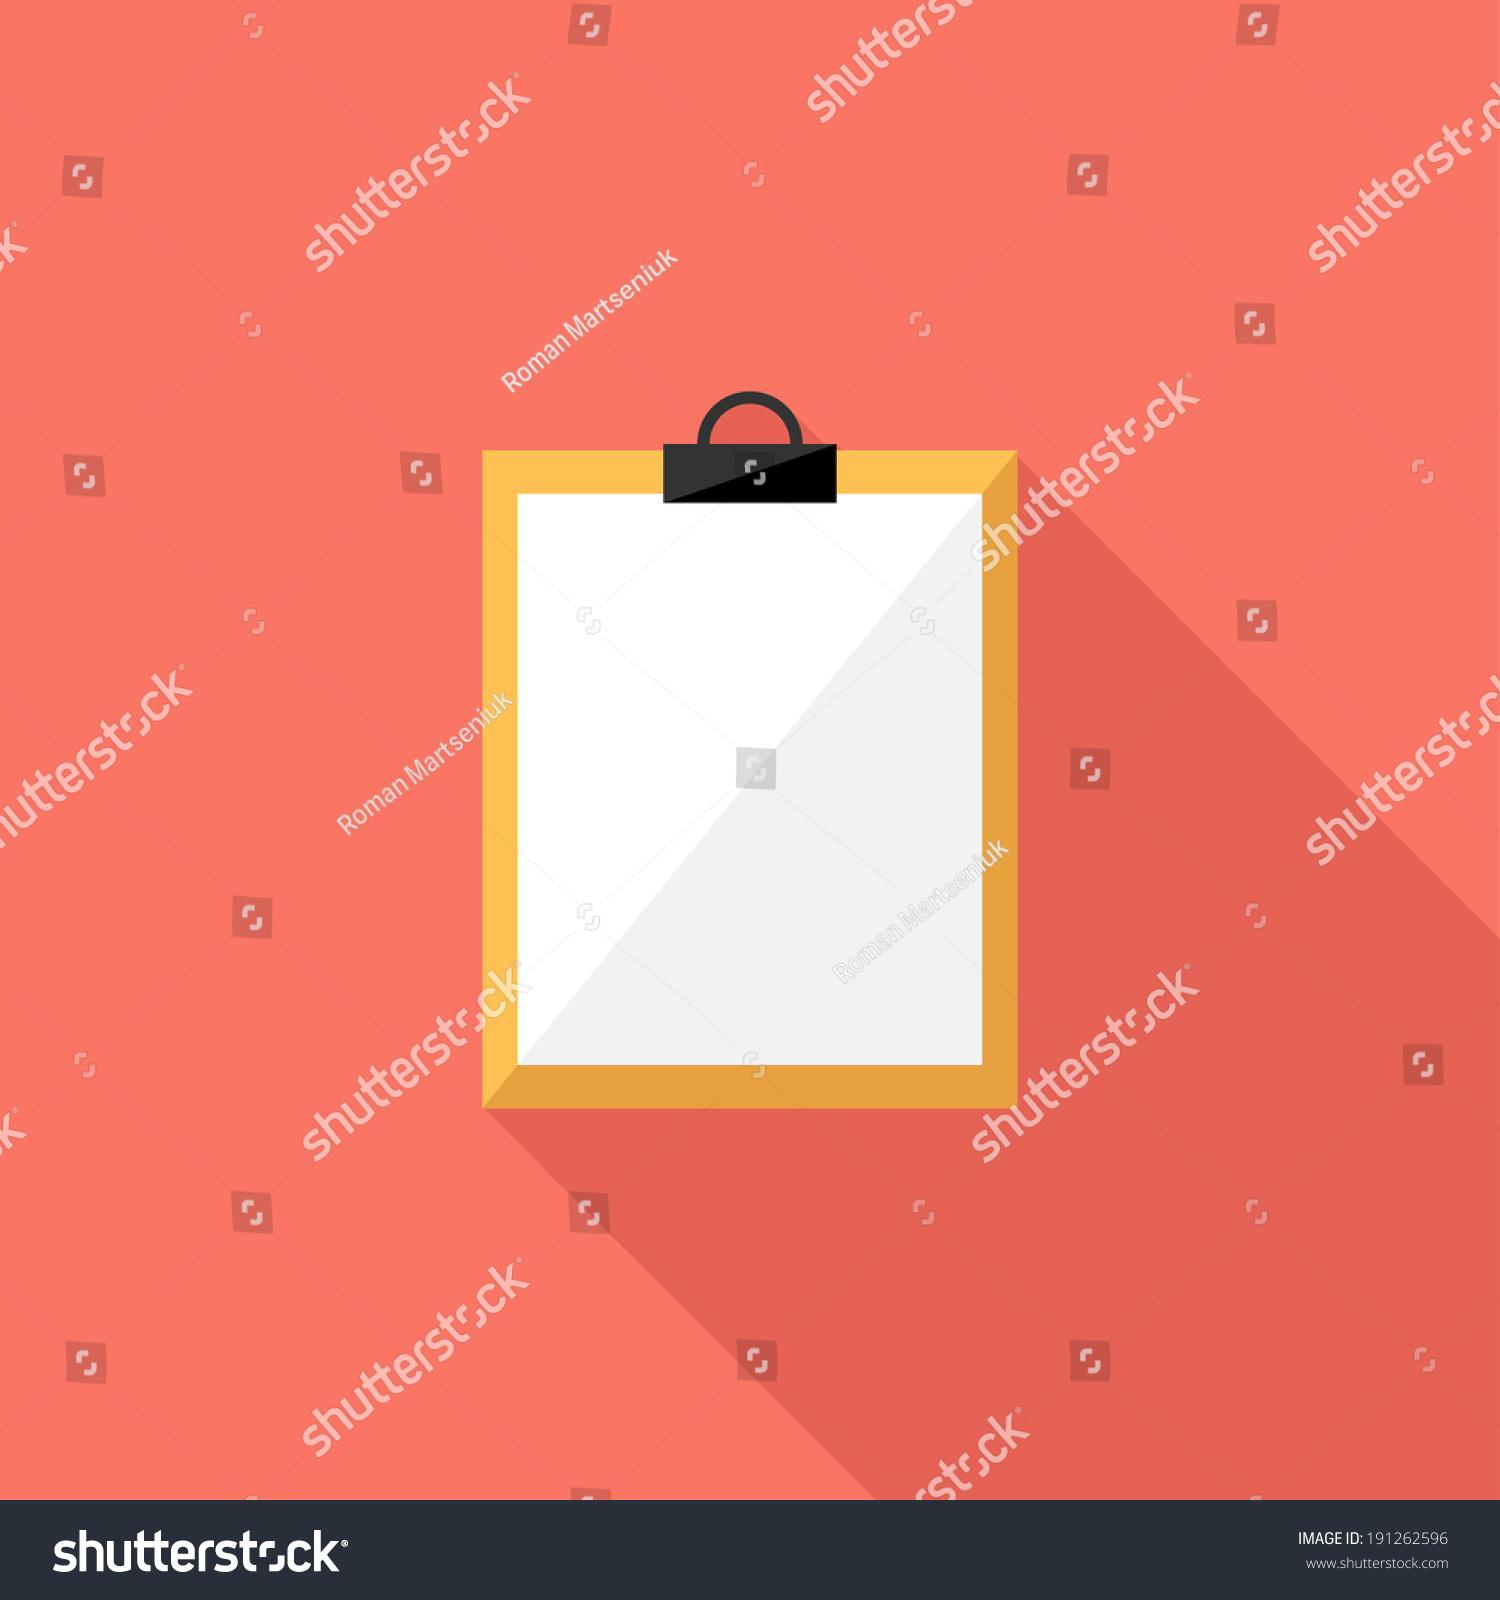 document background designs